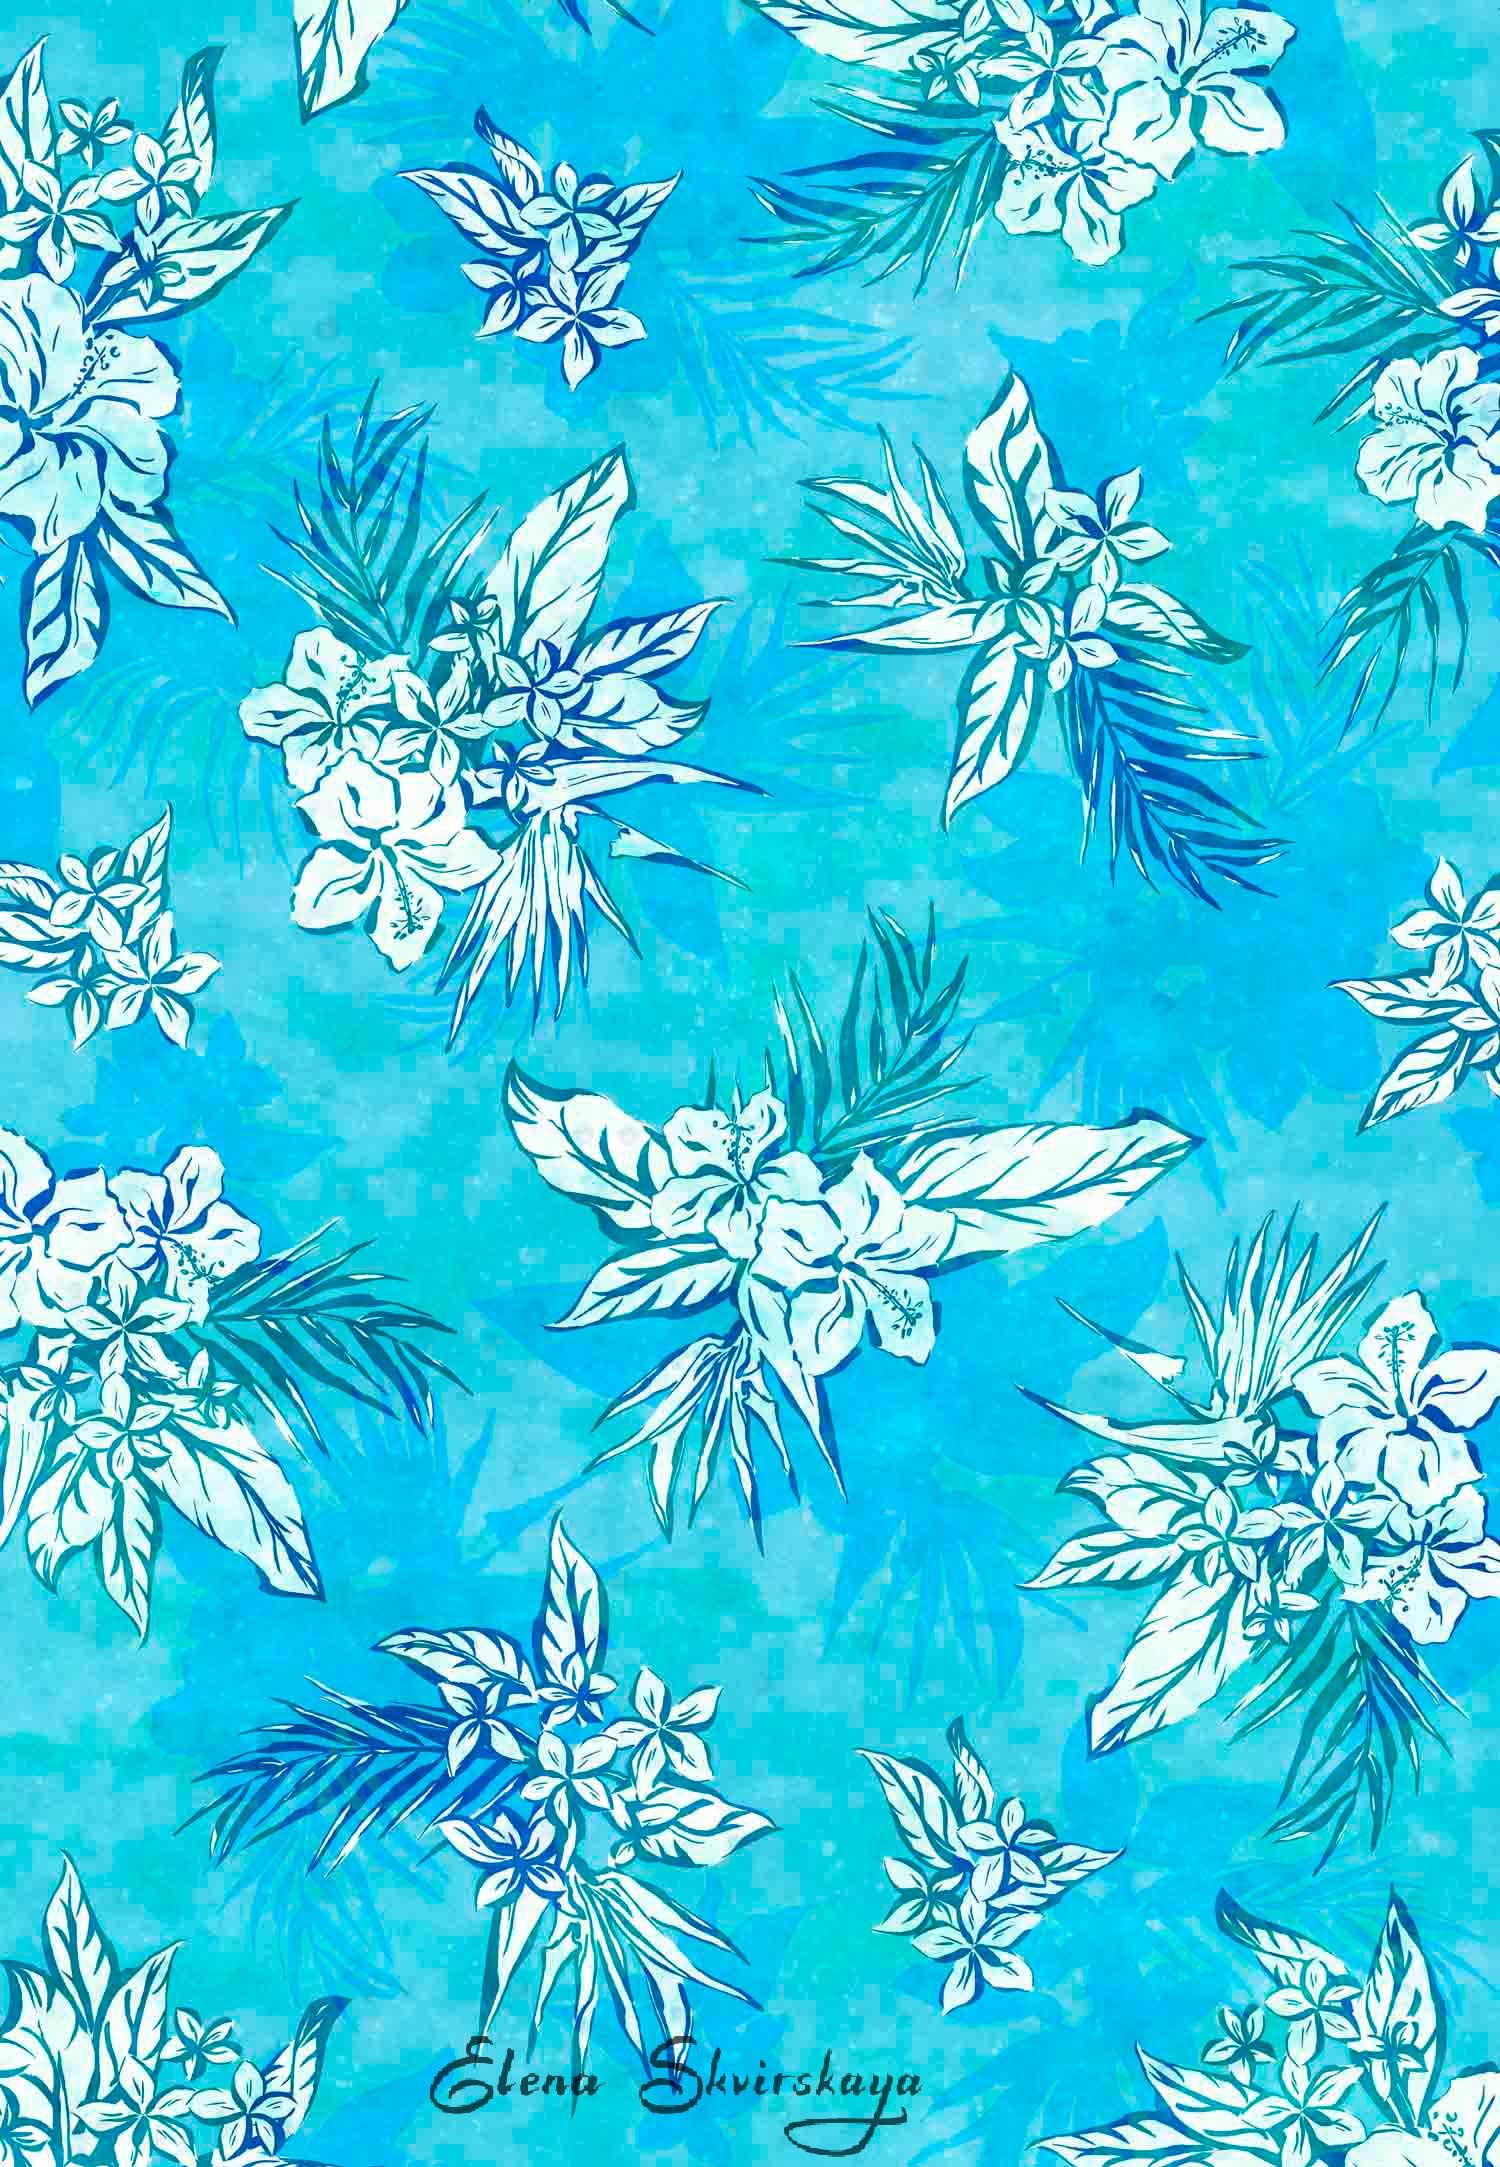 tropical print for fashion, swimwear, resort wear, home decor